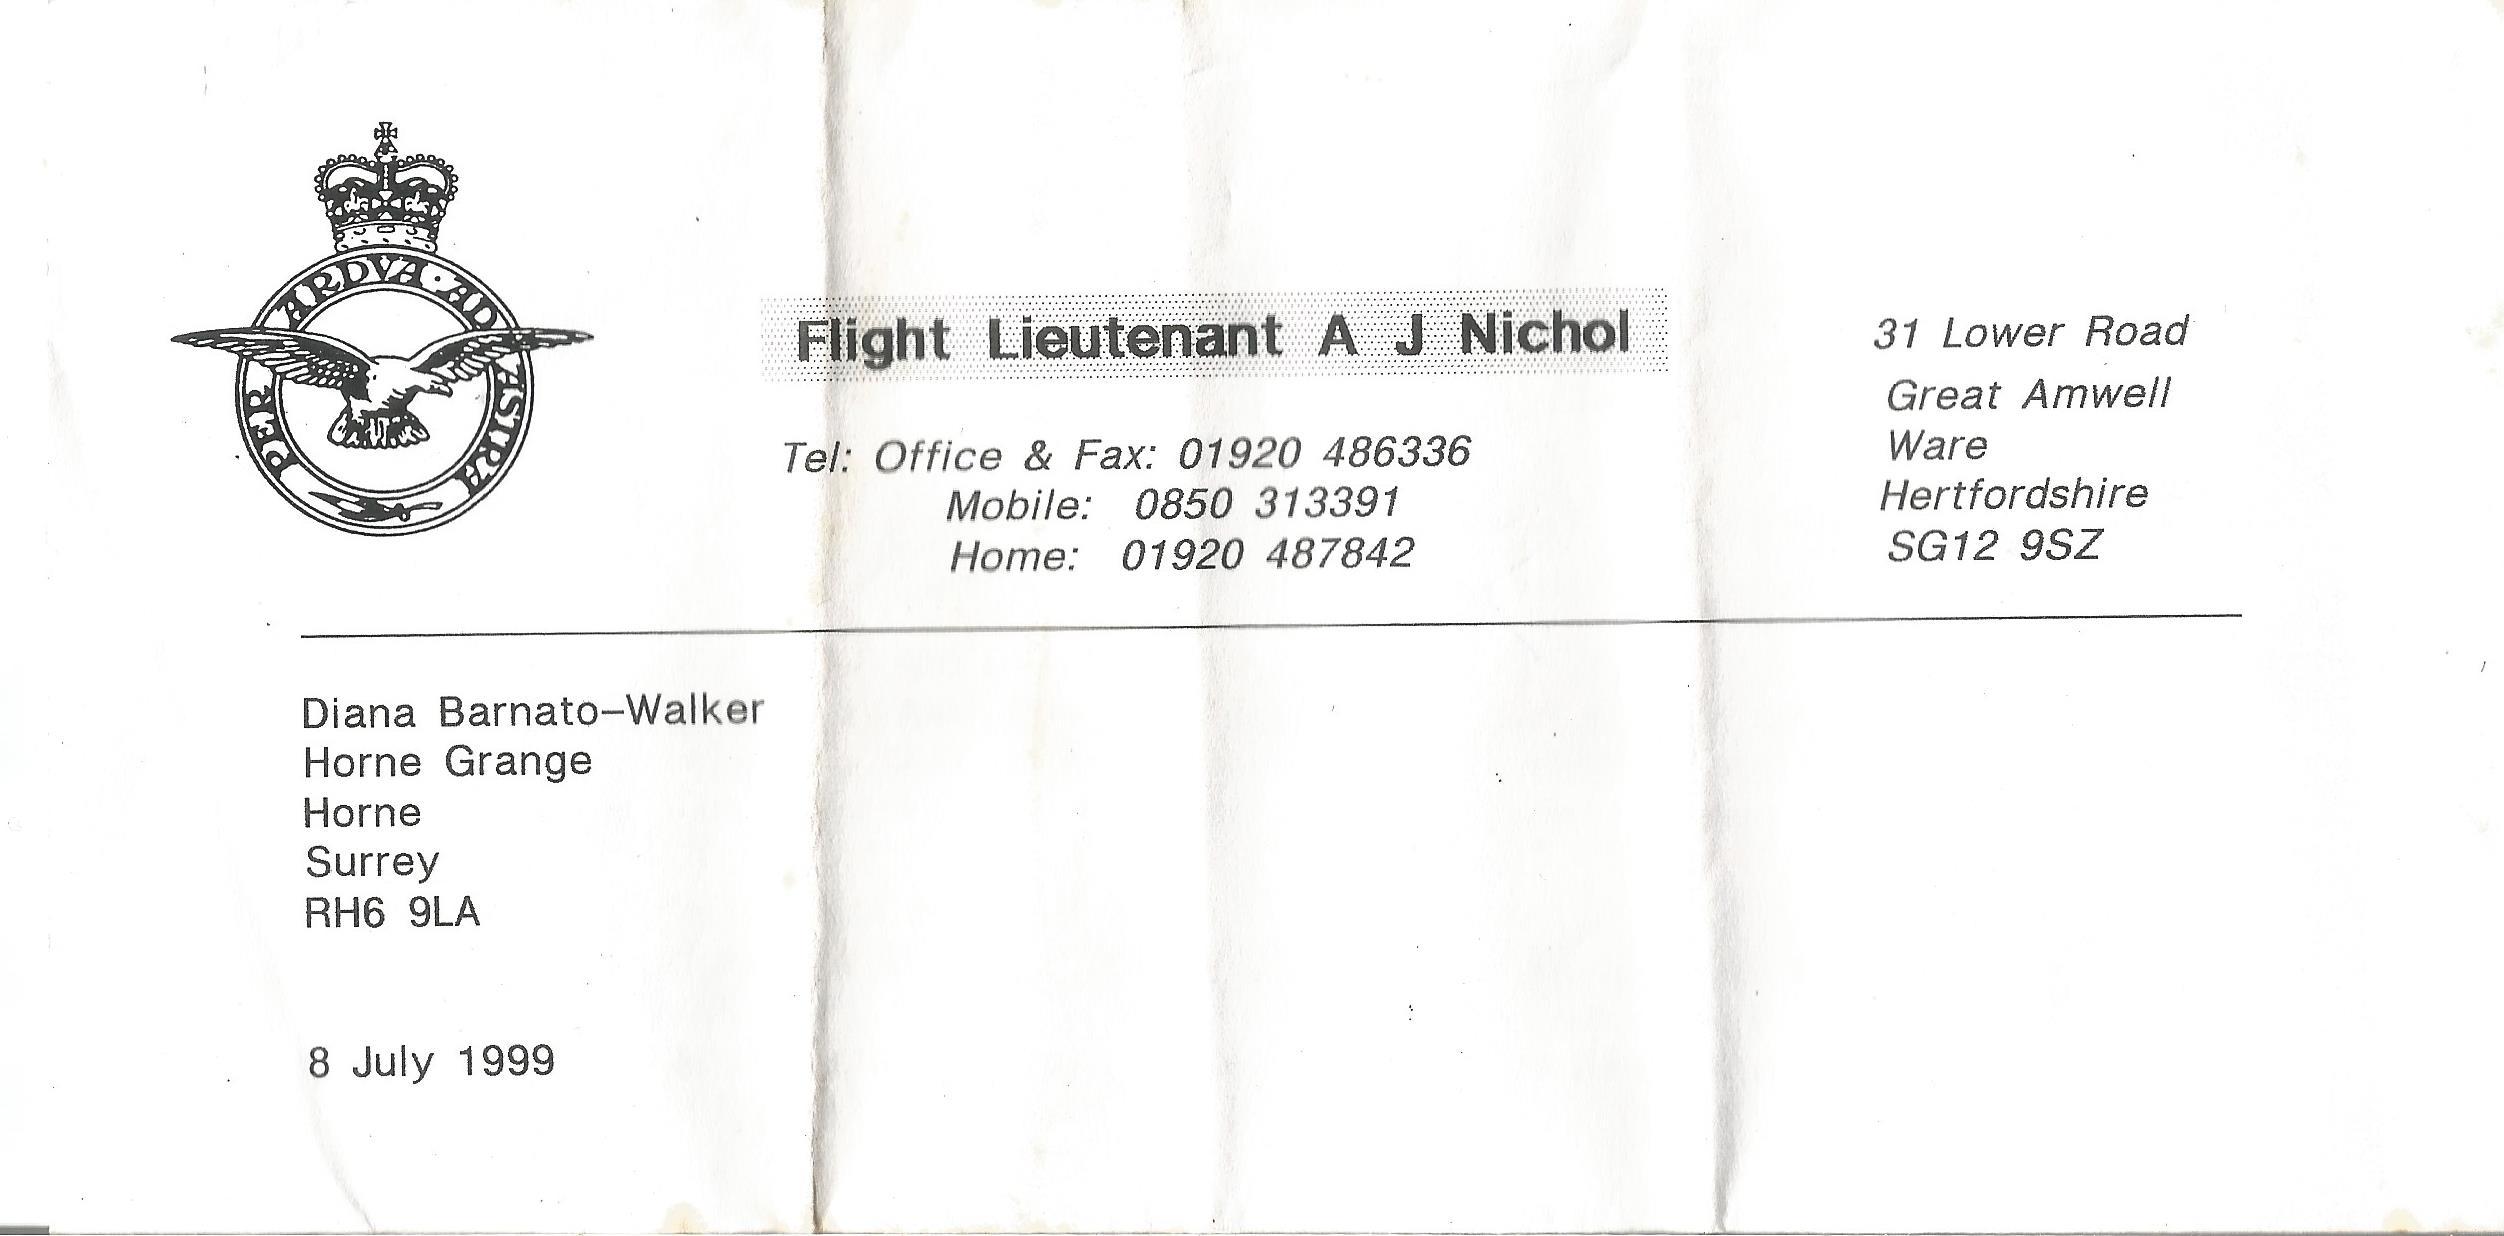 RAF Flight Lieutenants John Peters and John Nichol Paperback Book Tornado Down signed by John Nichol - Image 3 of 3